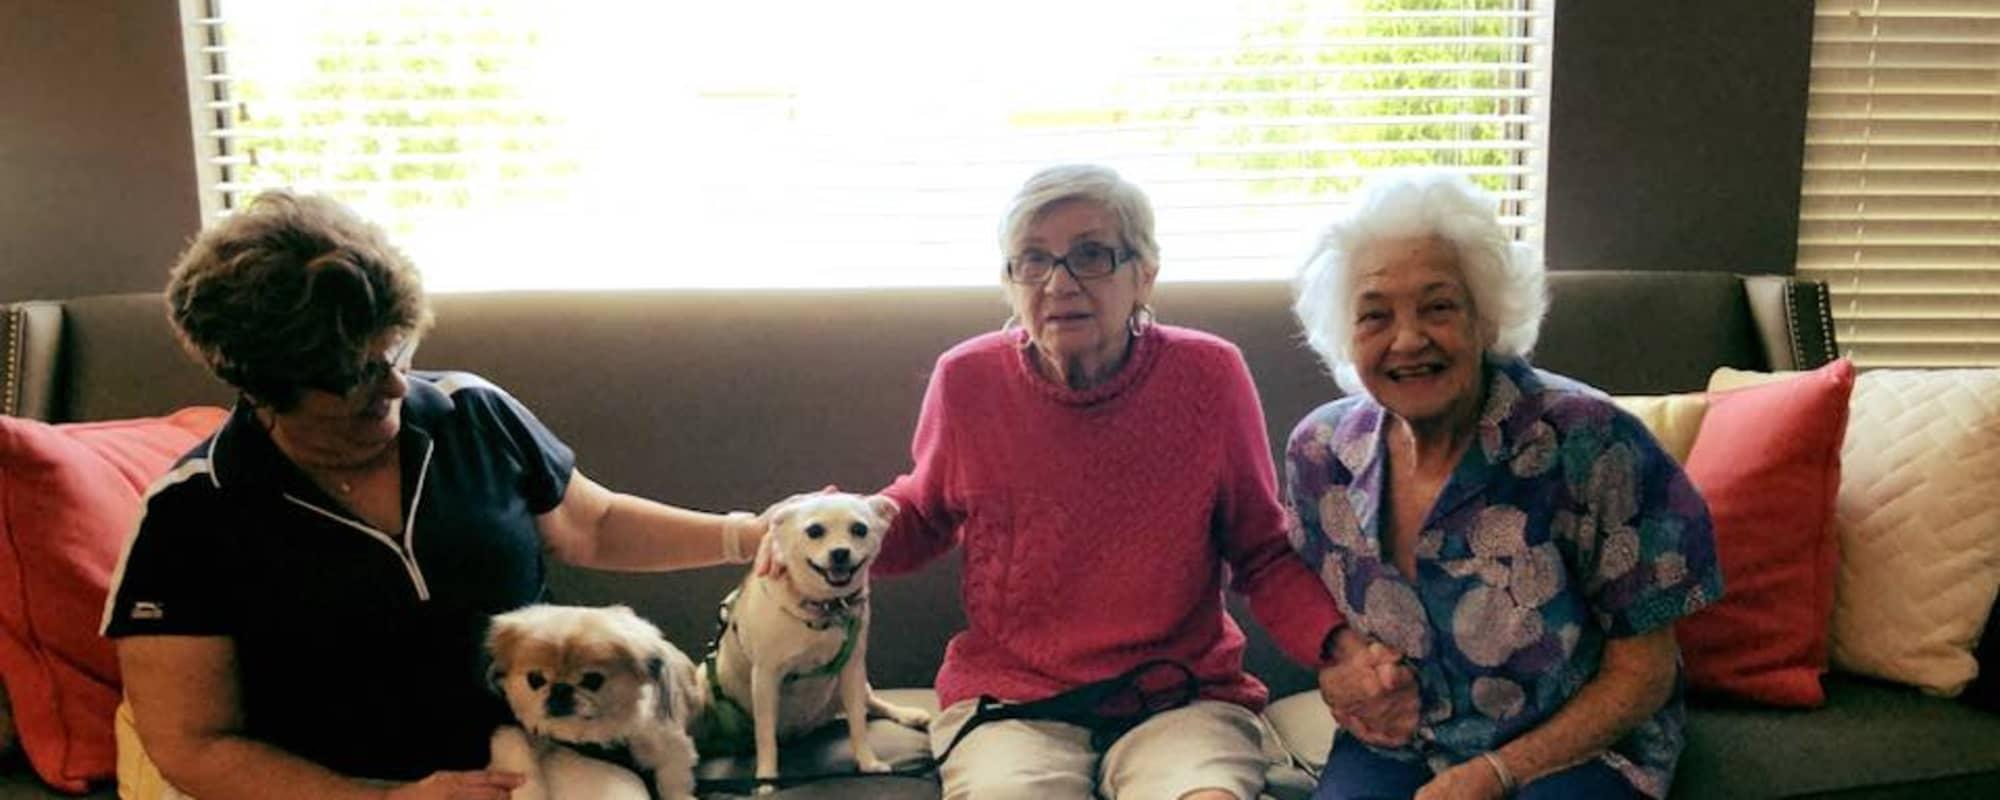 Seniors petting dogs at Hacienda Del Rey in Litchfield Park, Arizona